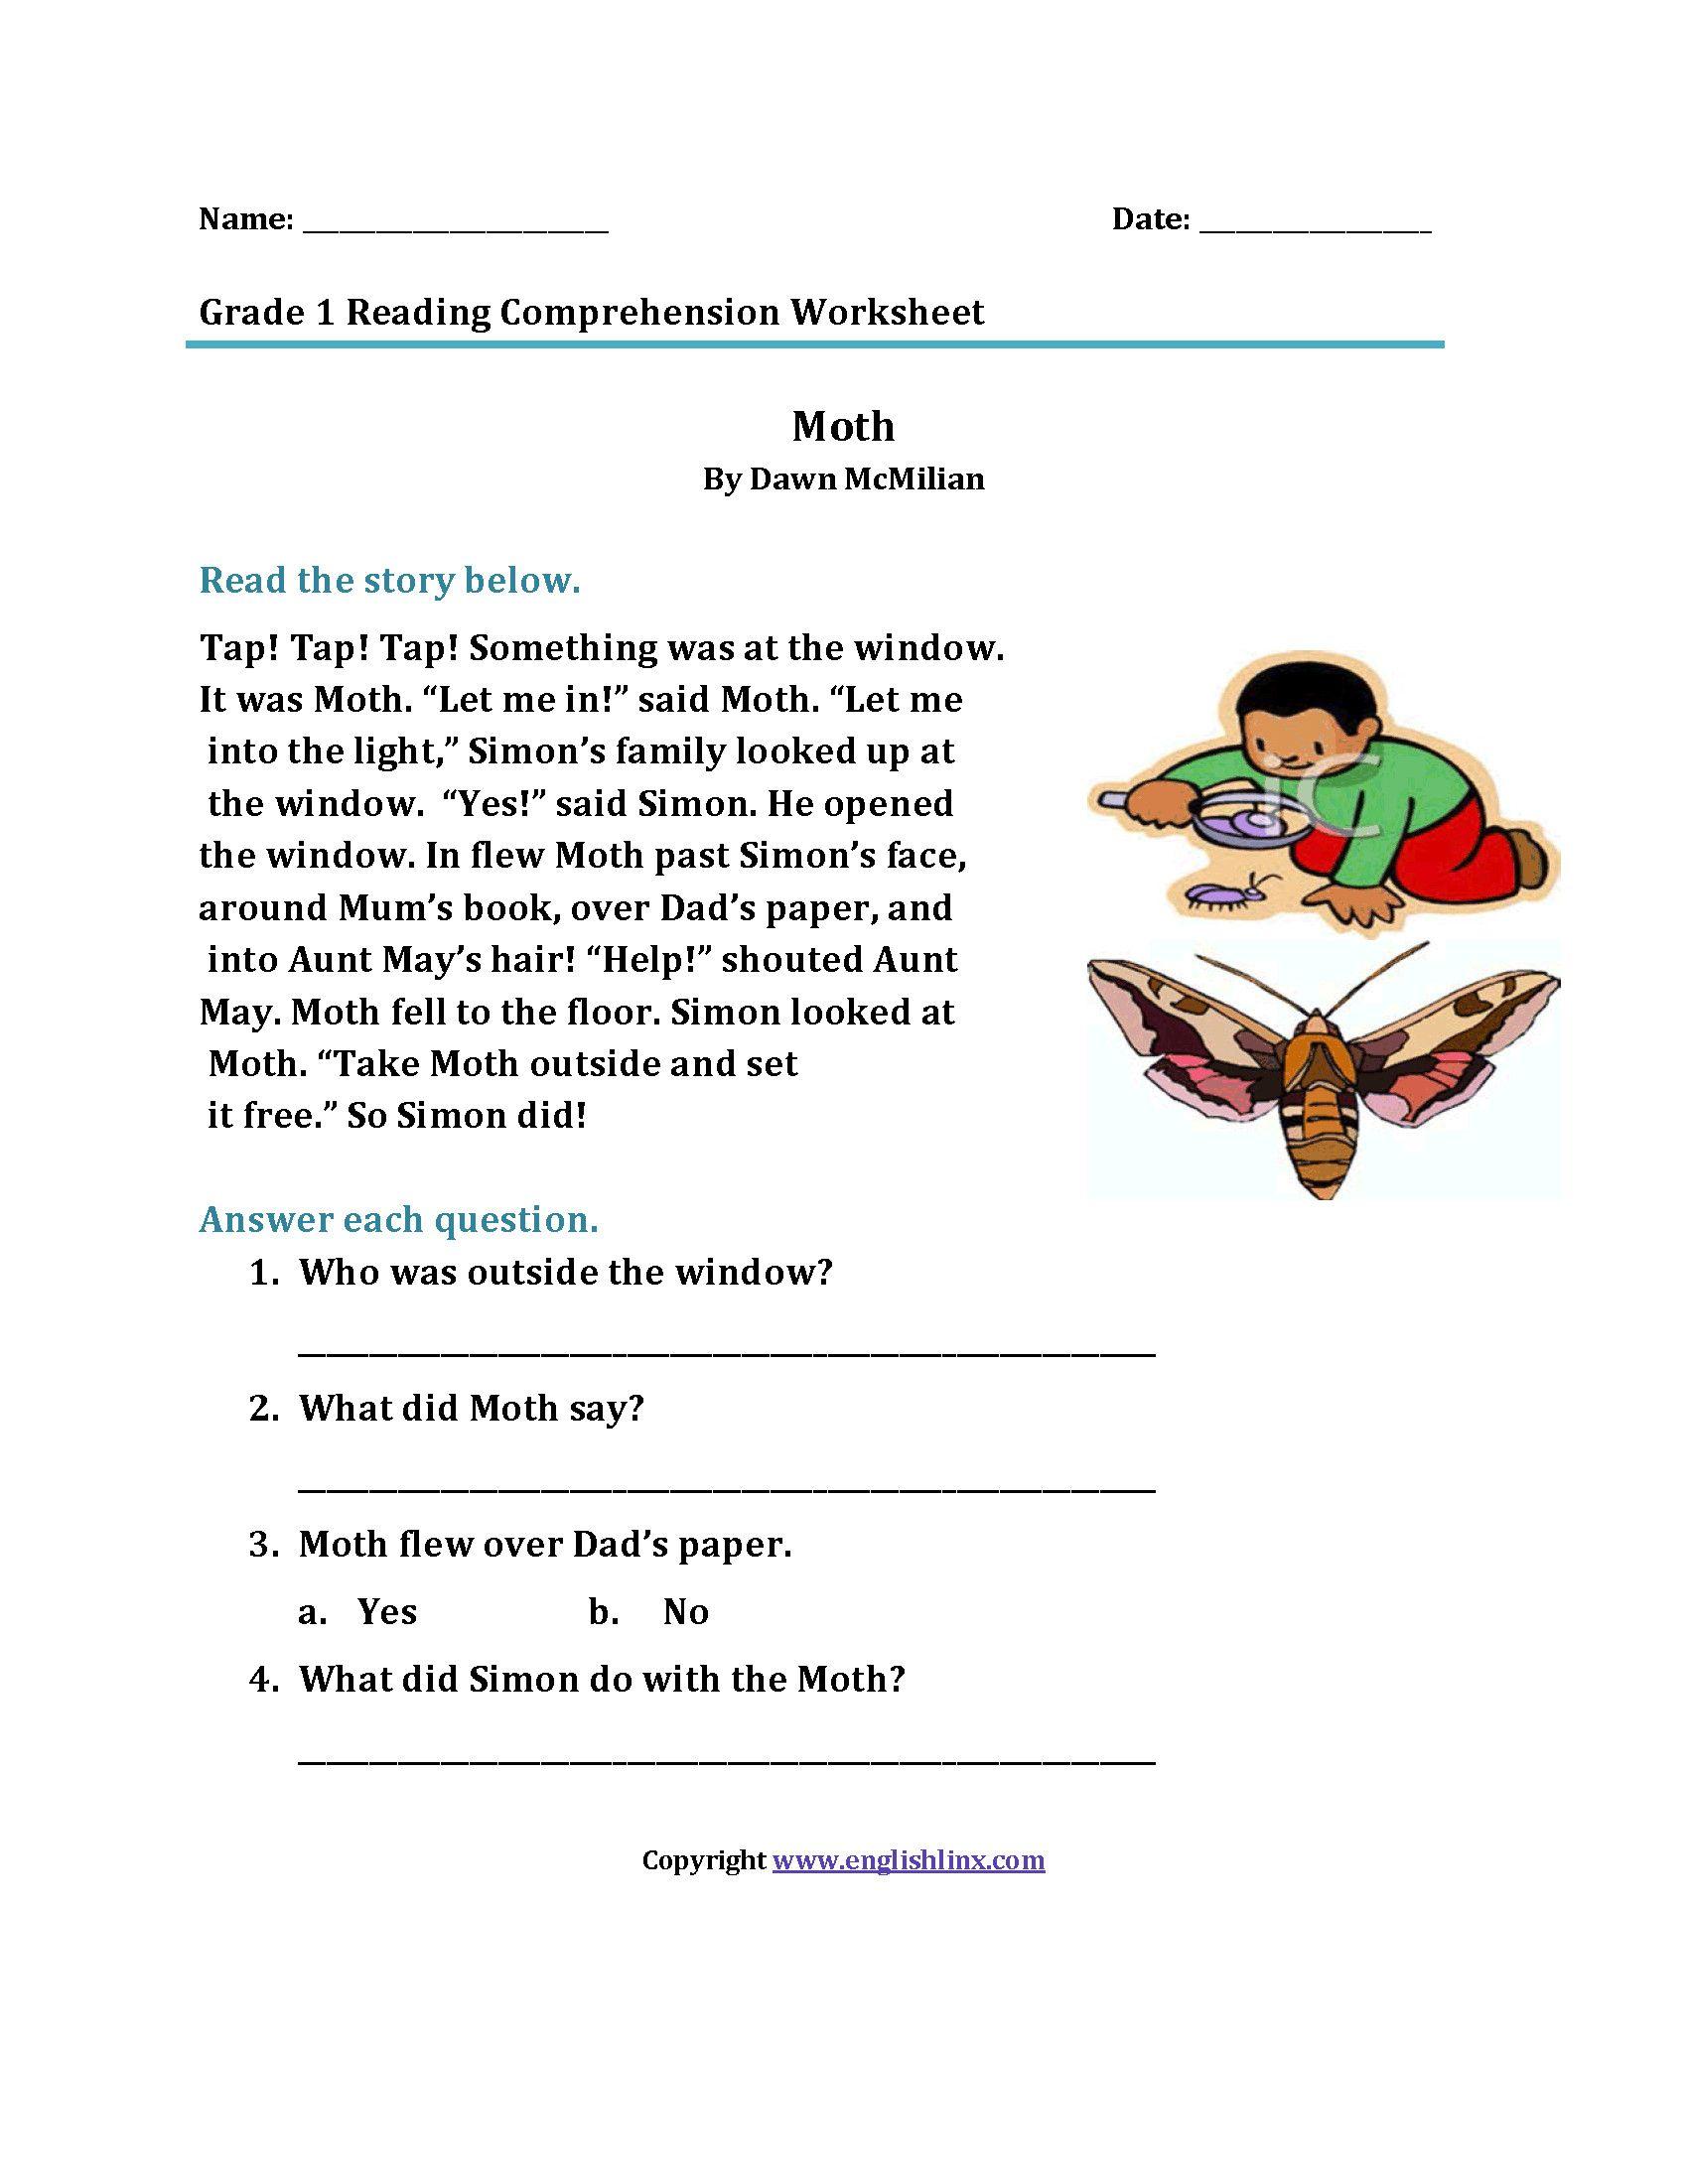 Reading Worksheets For 1st Grade In